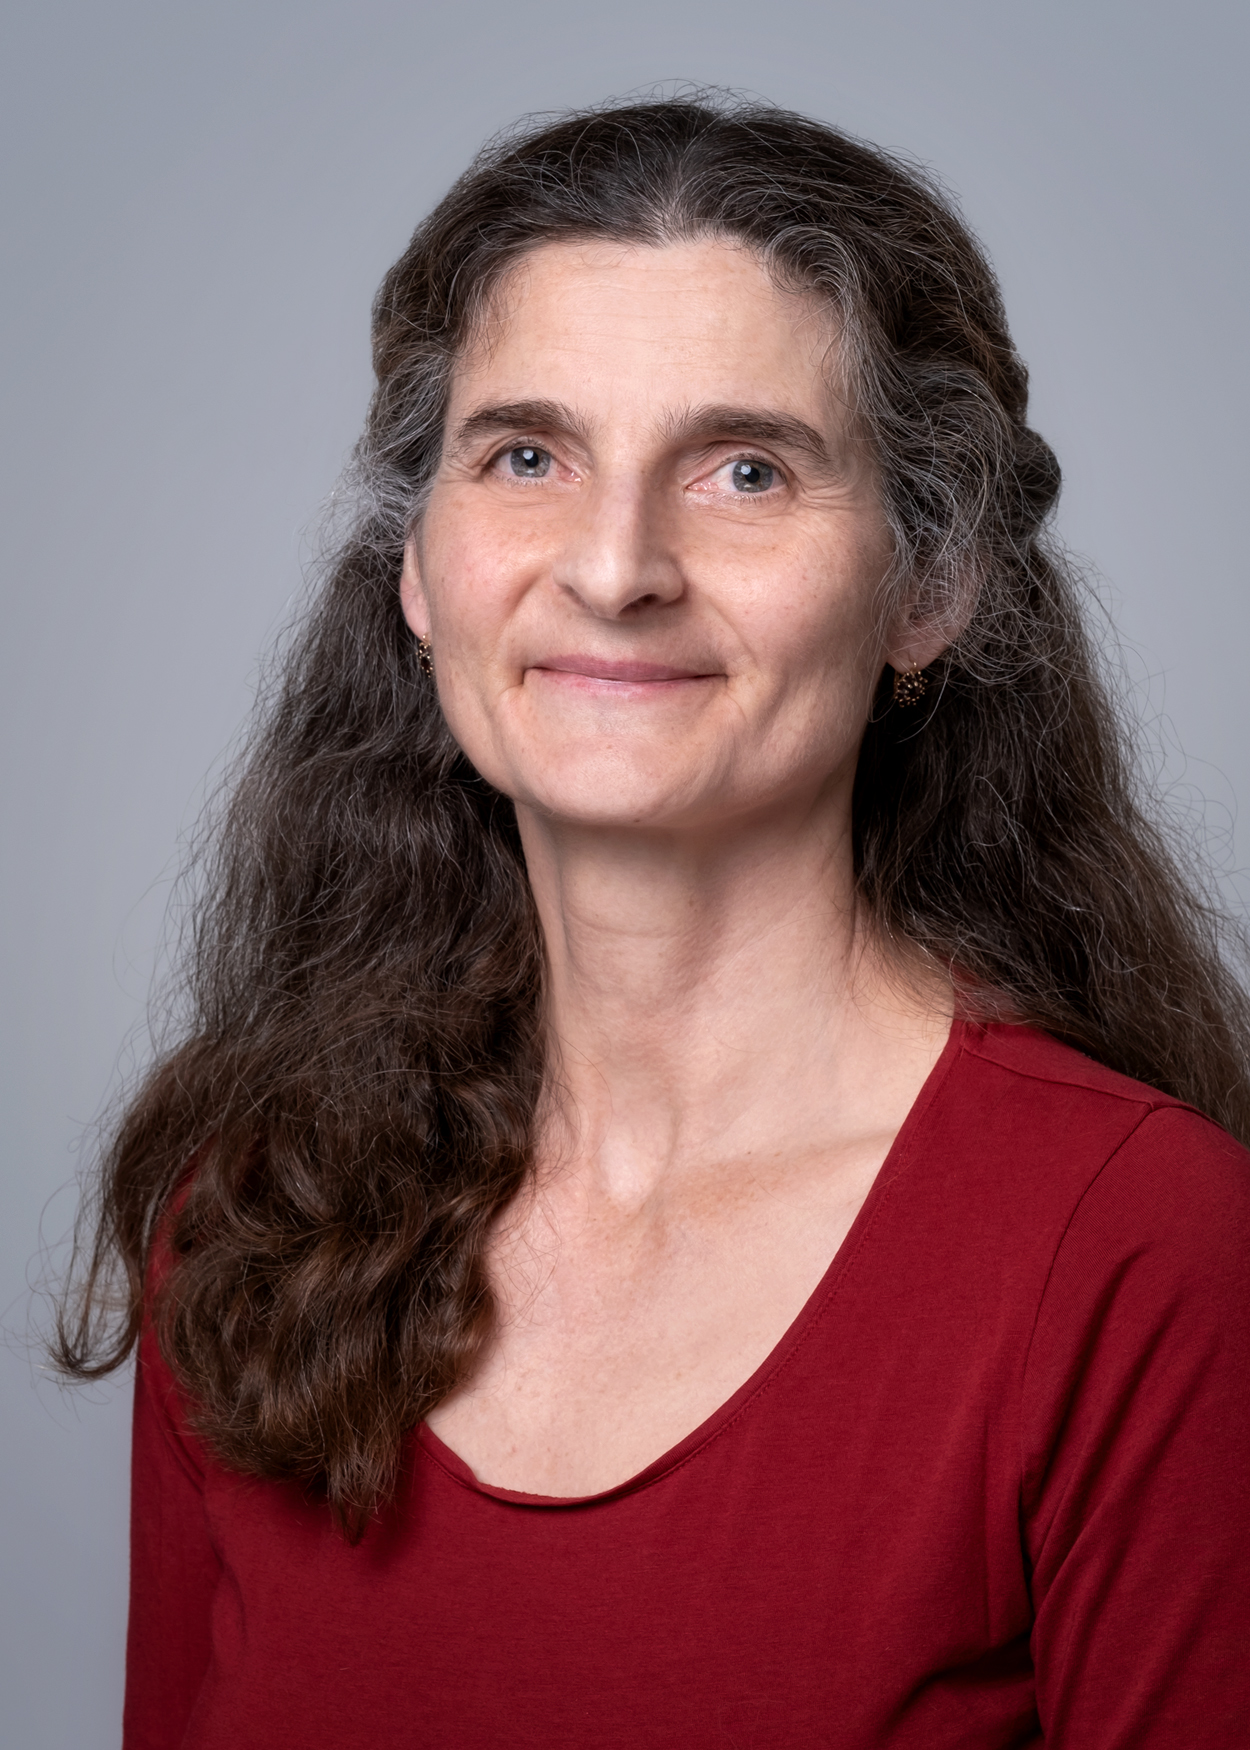 Dr. Pamela Graves